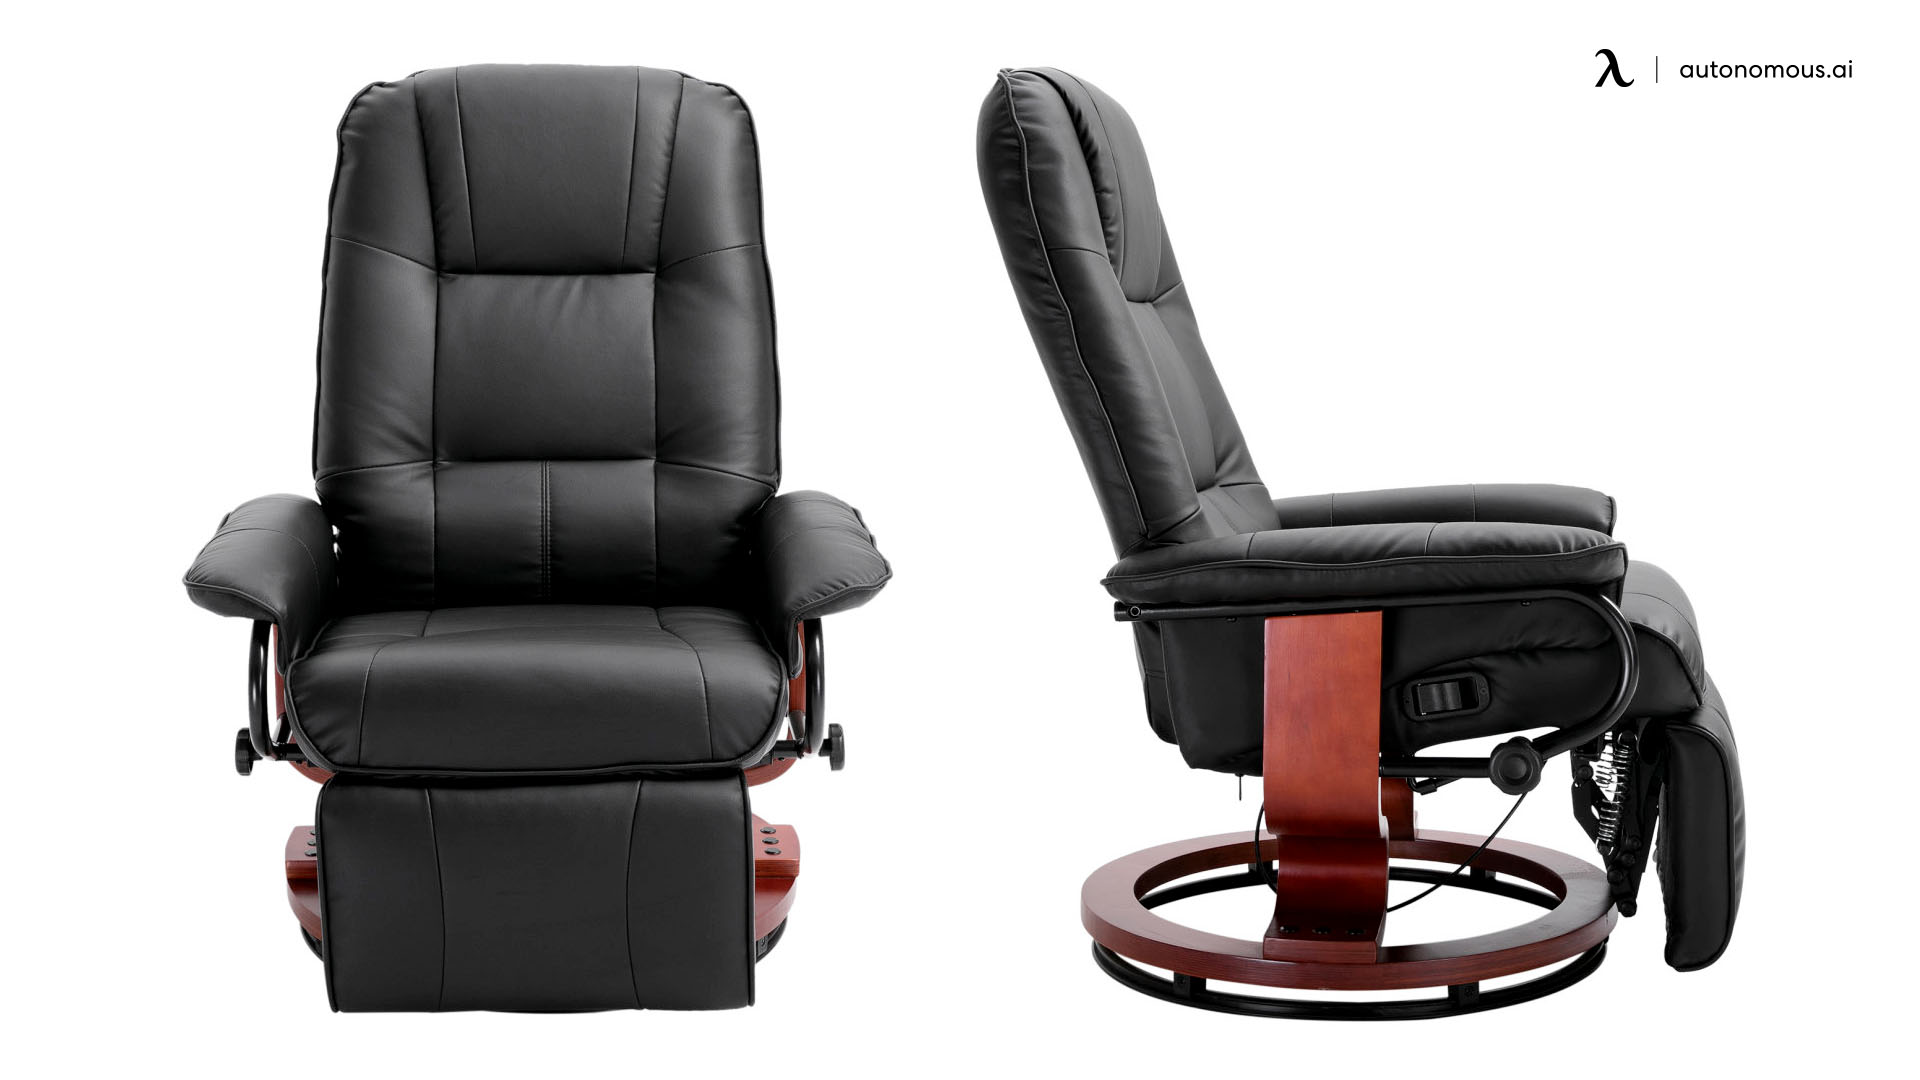 HOMCOM ergonomic office recliner